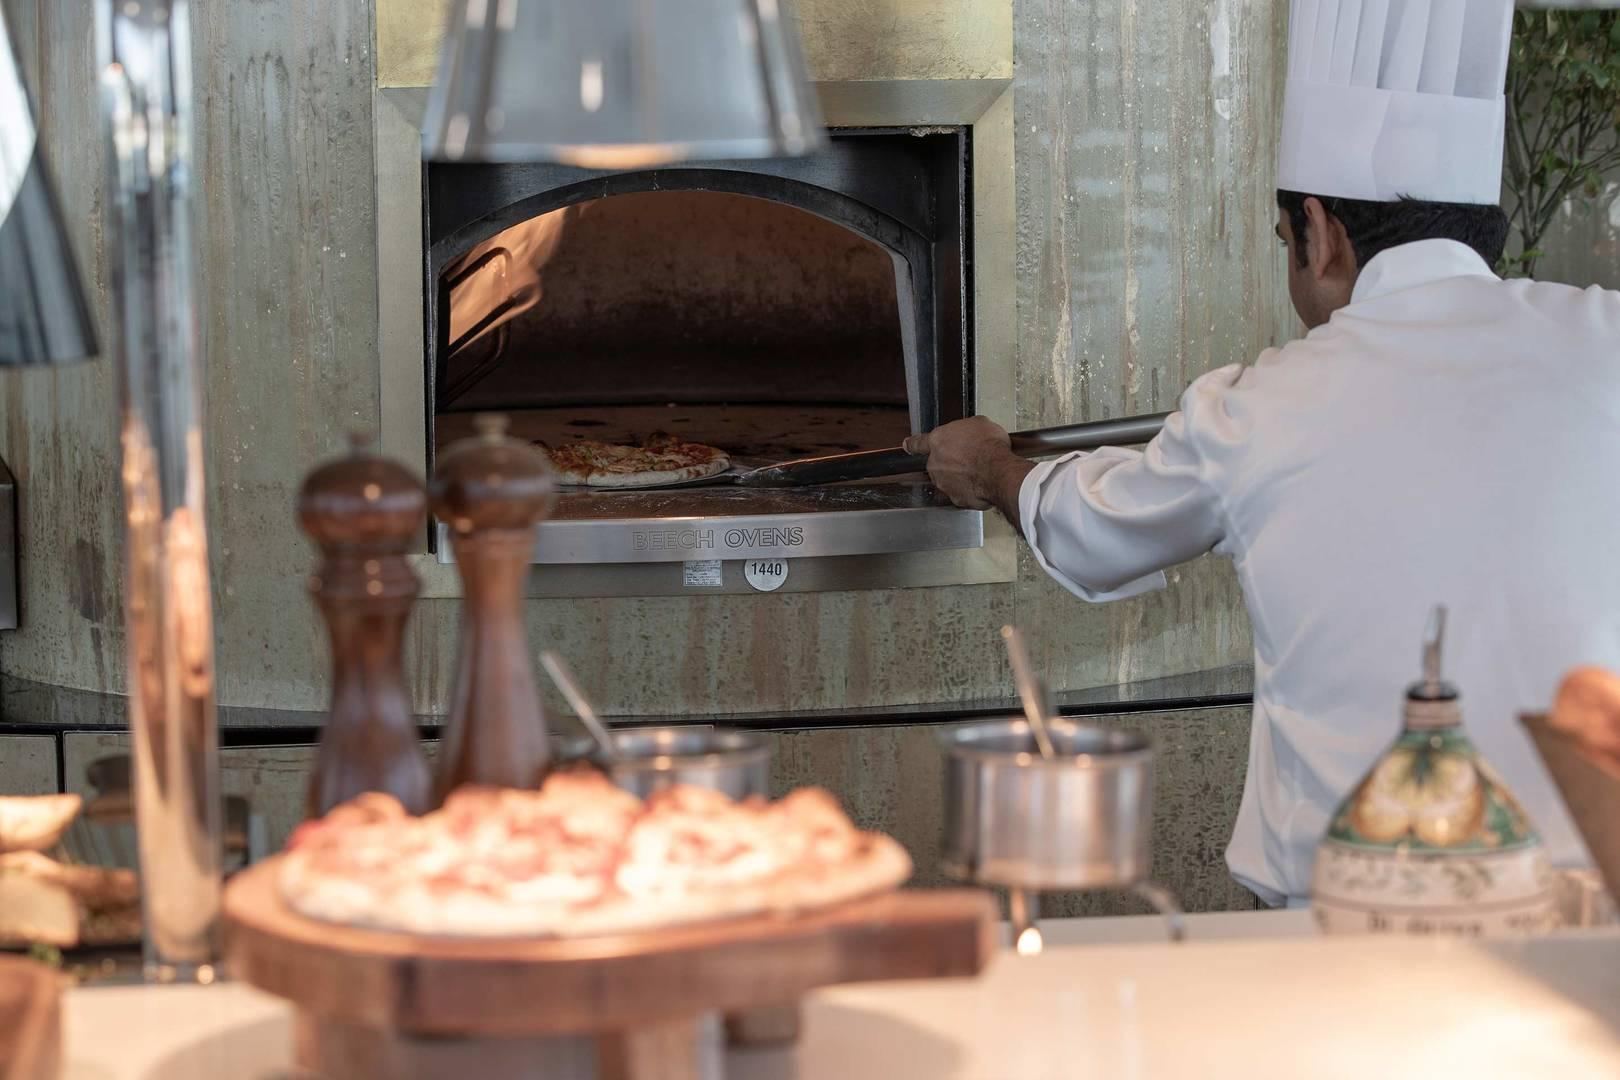 https://cdn.jumeirah.com/-/mediadh/DH/Hospitality/Jumeirah/Restaurants/Dubai/Burj-Al-Arab-Bab-Al-Yam/Restaurant-Gallery/Burj-Al-Arab-Bab-Al-Yam-Pizza-Oven_6-4.jpg?h=1080&w=1620&hash=C9AF5C8705D697D897998F3471AFC190